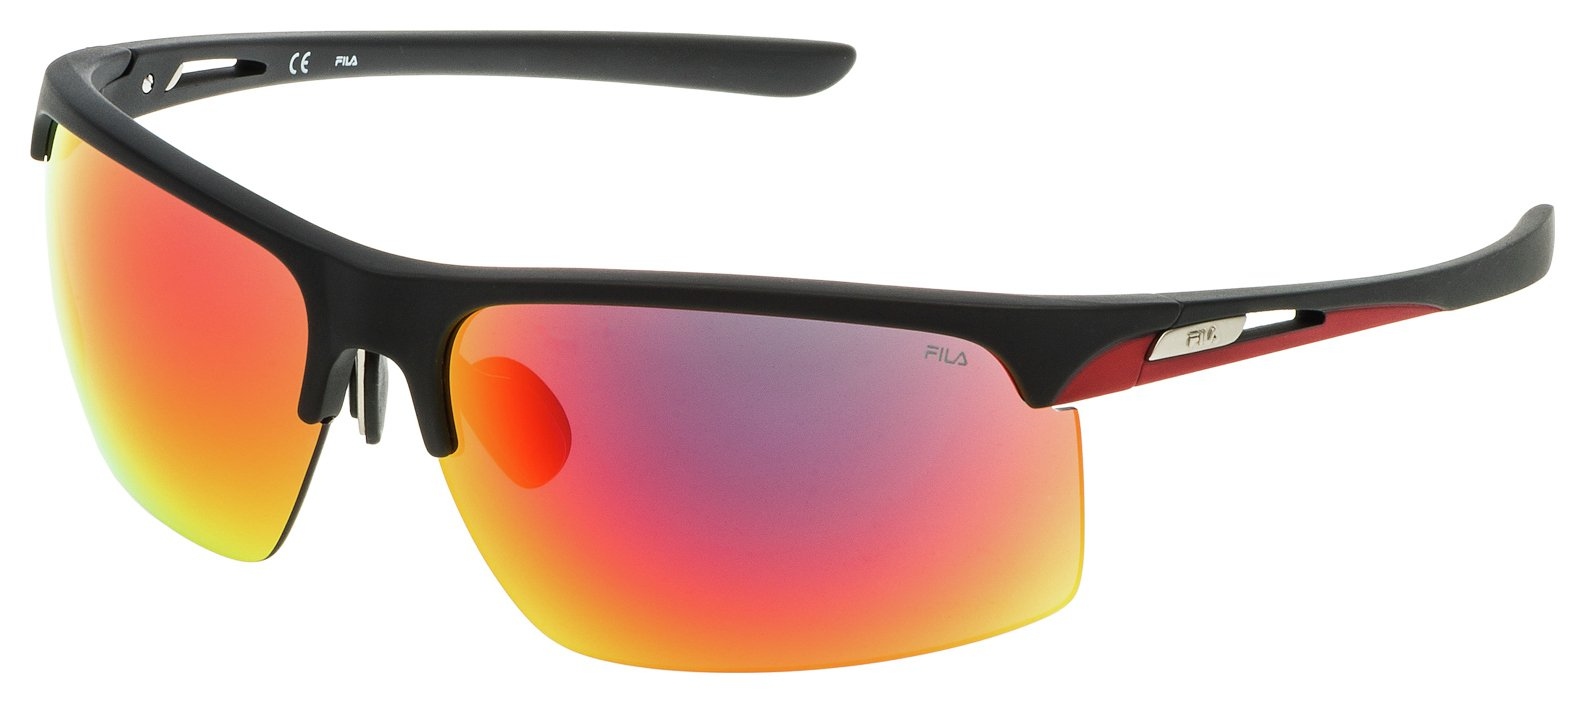 Image of Fila Black Multi Lens Sunglasses.